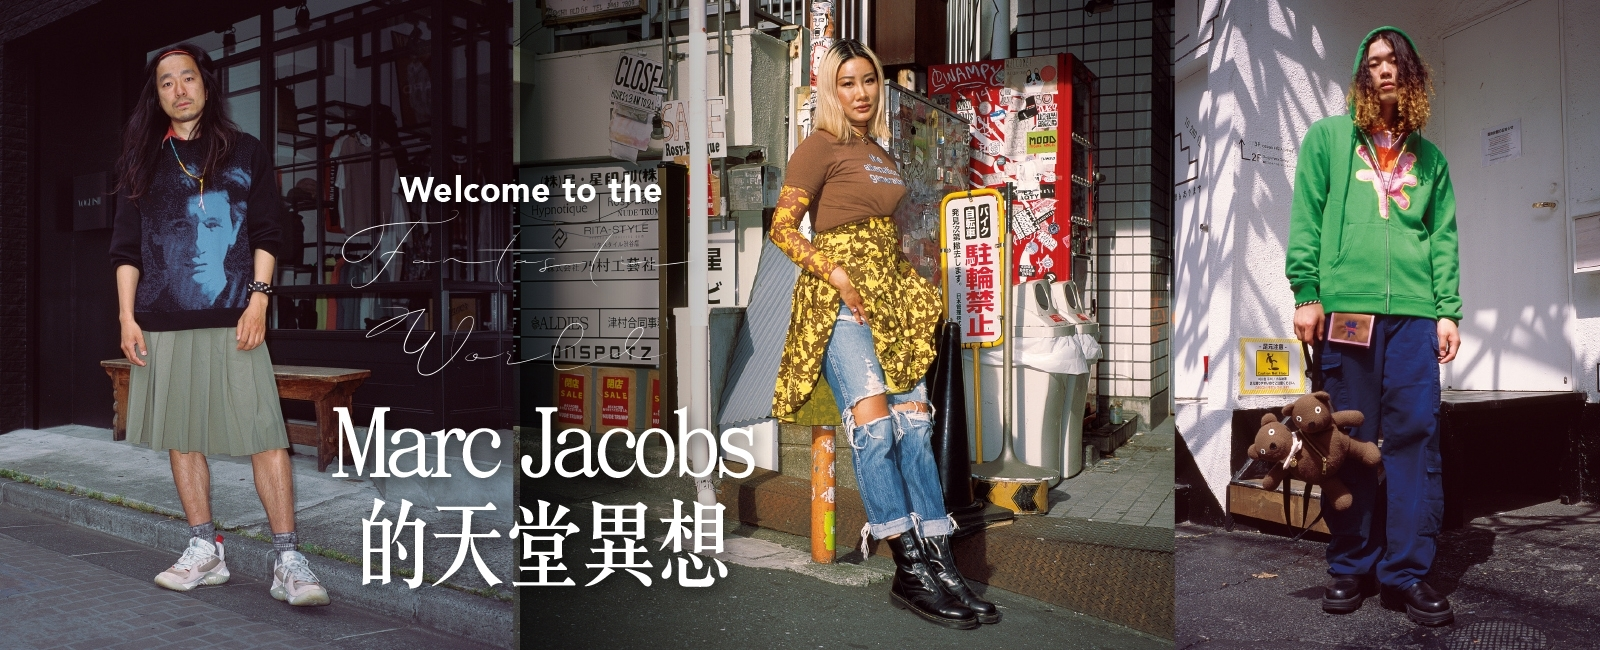 Marc Jacobs的天堂異想